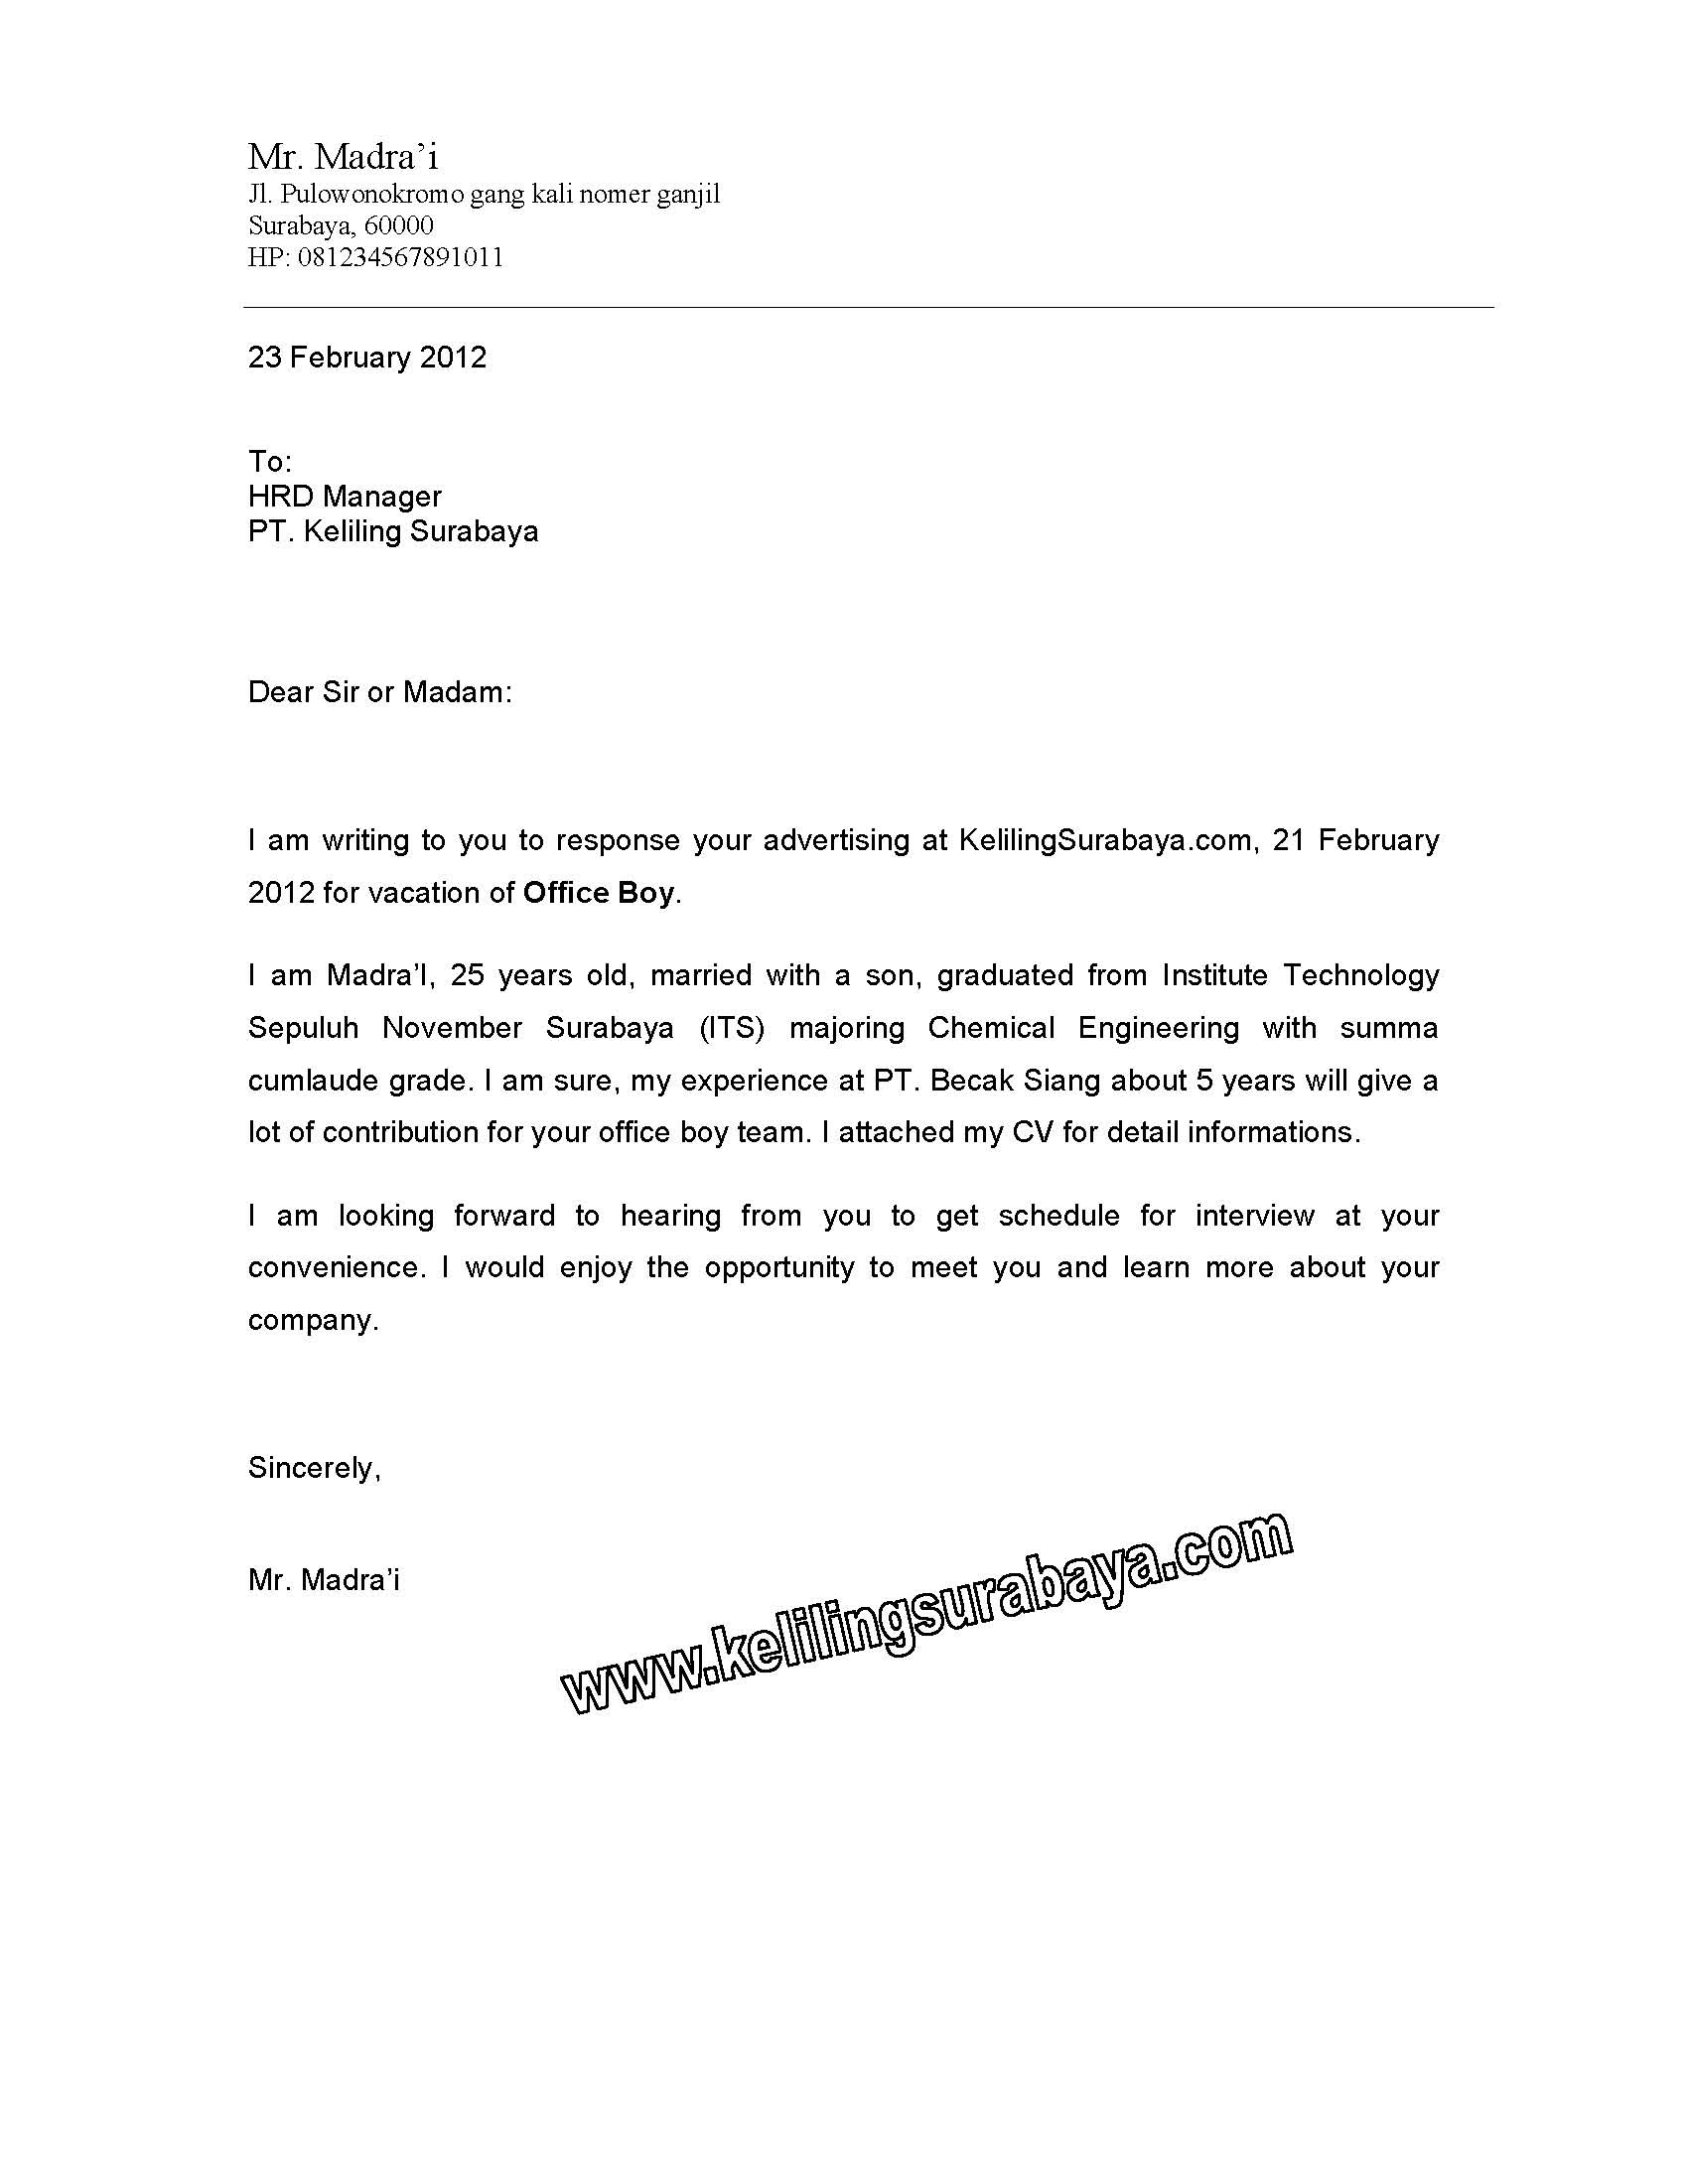 19 Contoh Surat Balasan Lamaran Pekerjaan Menggunakan Bahasa Inggris